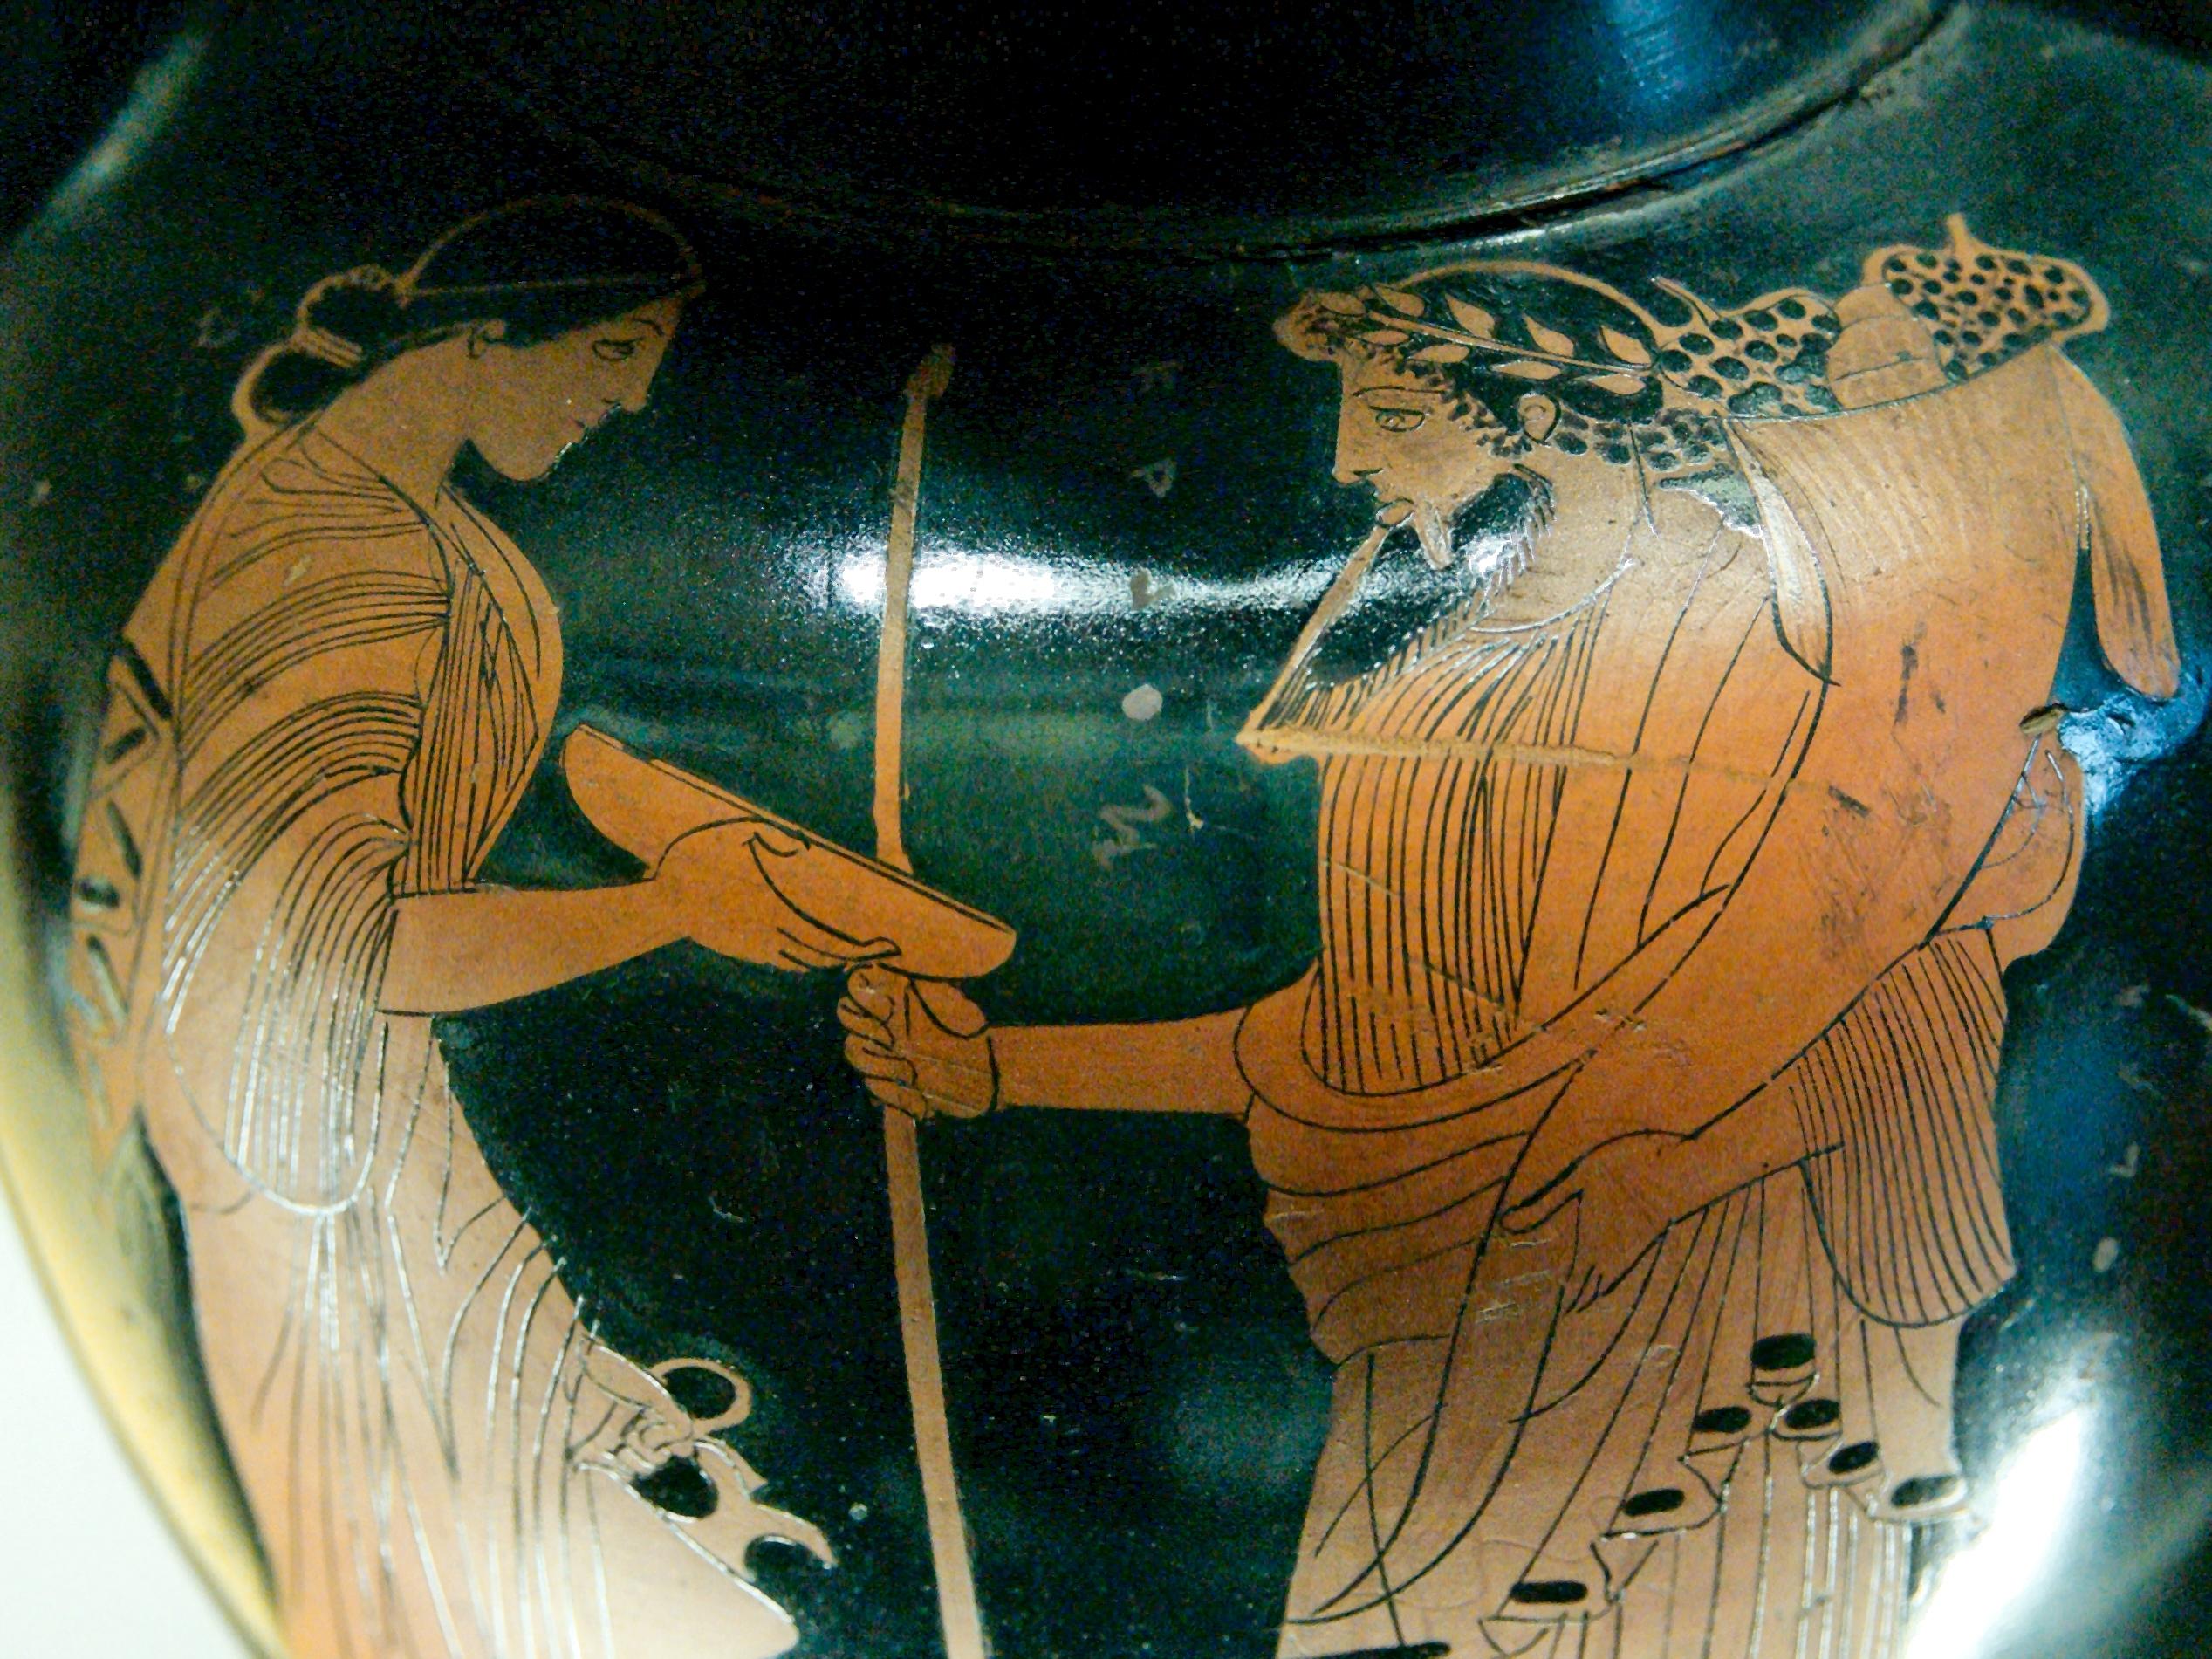 Datoteka:Amphora Hades Louvre G209 n2.jpg - Wikipedia